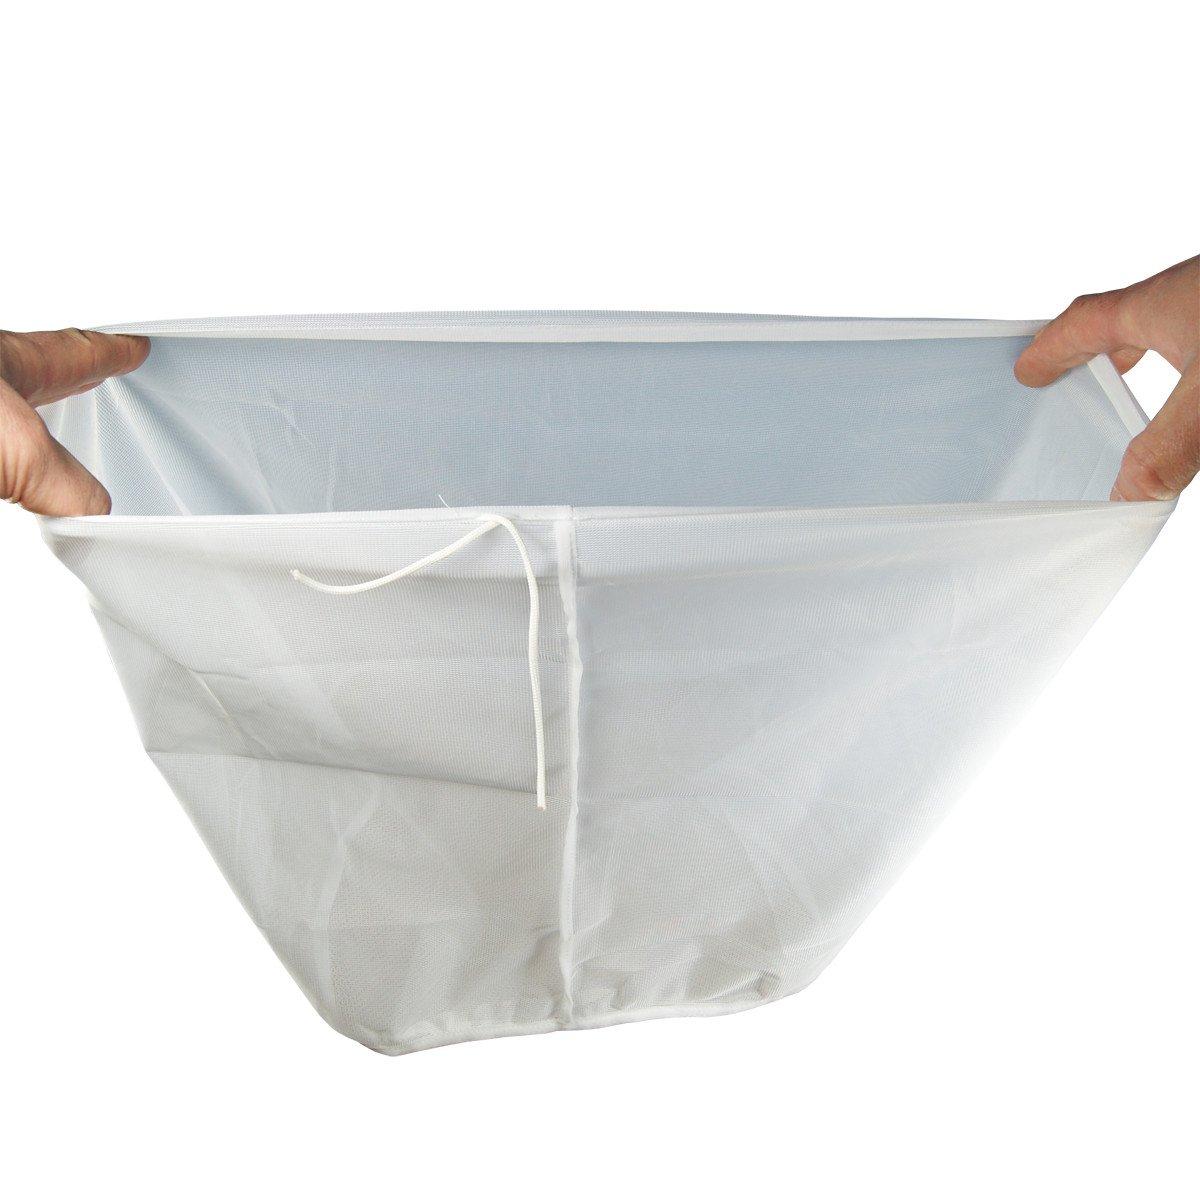 Balliihoo® Mashing And Sparging - Straining Bag With Cord Balliihoo Homebrew